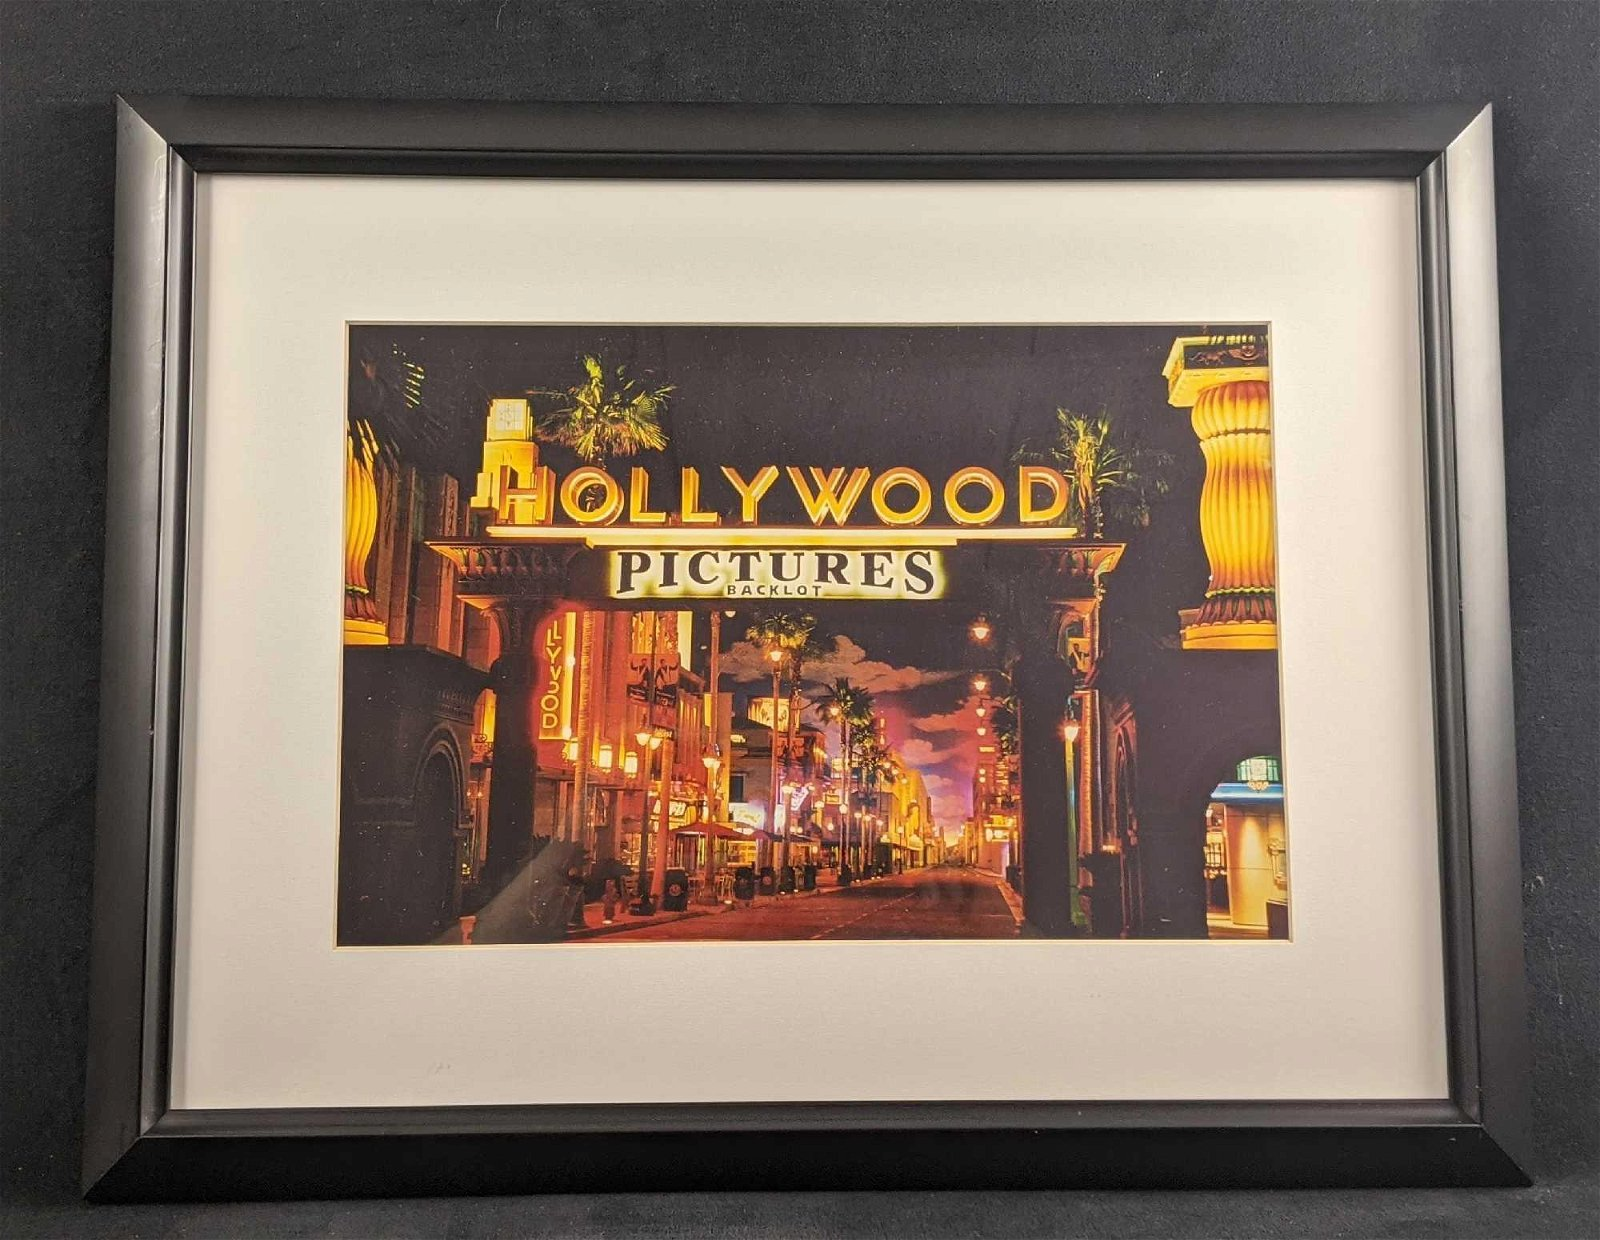 Disney Framed Photo Of Hollywood Pictures Backlot